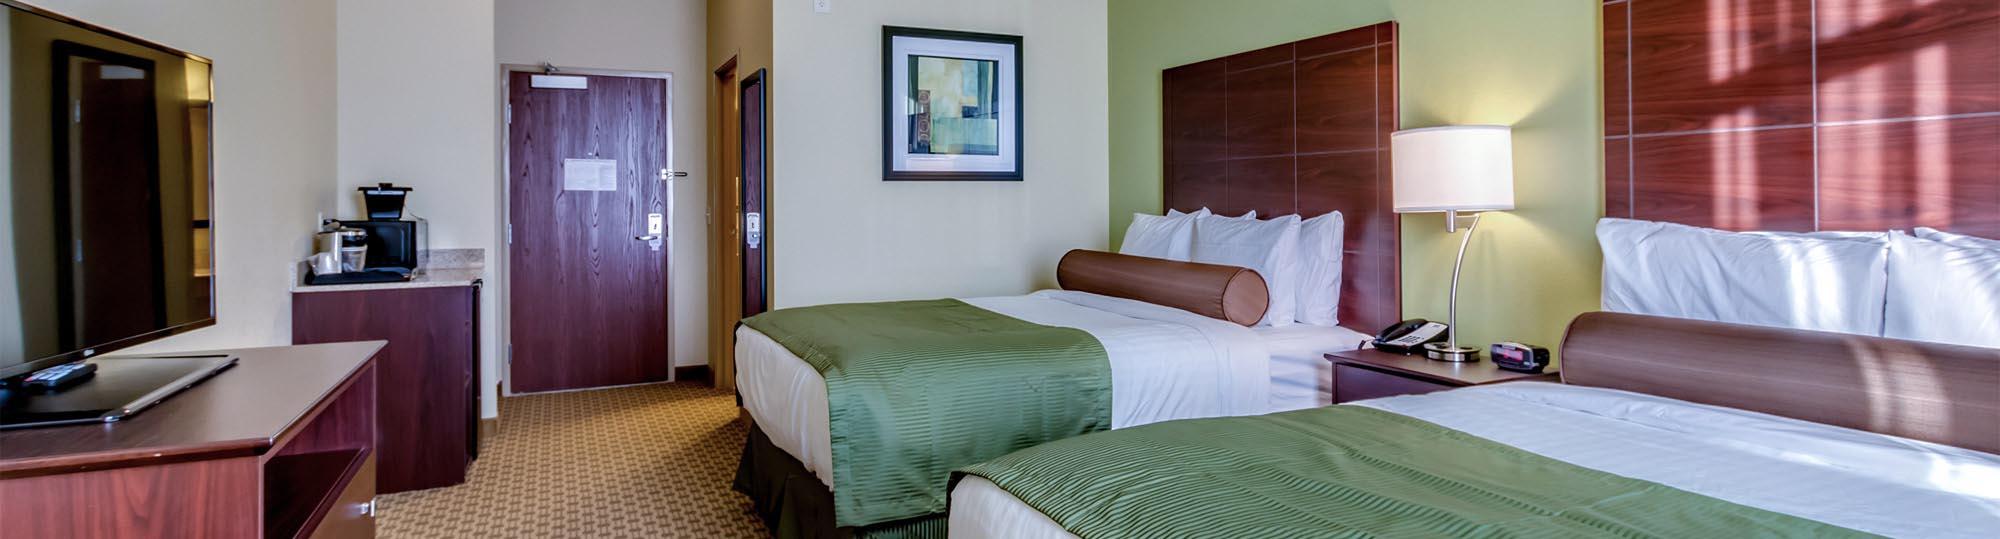 Cobblestone Inn & Suites Main Street Waverly